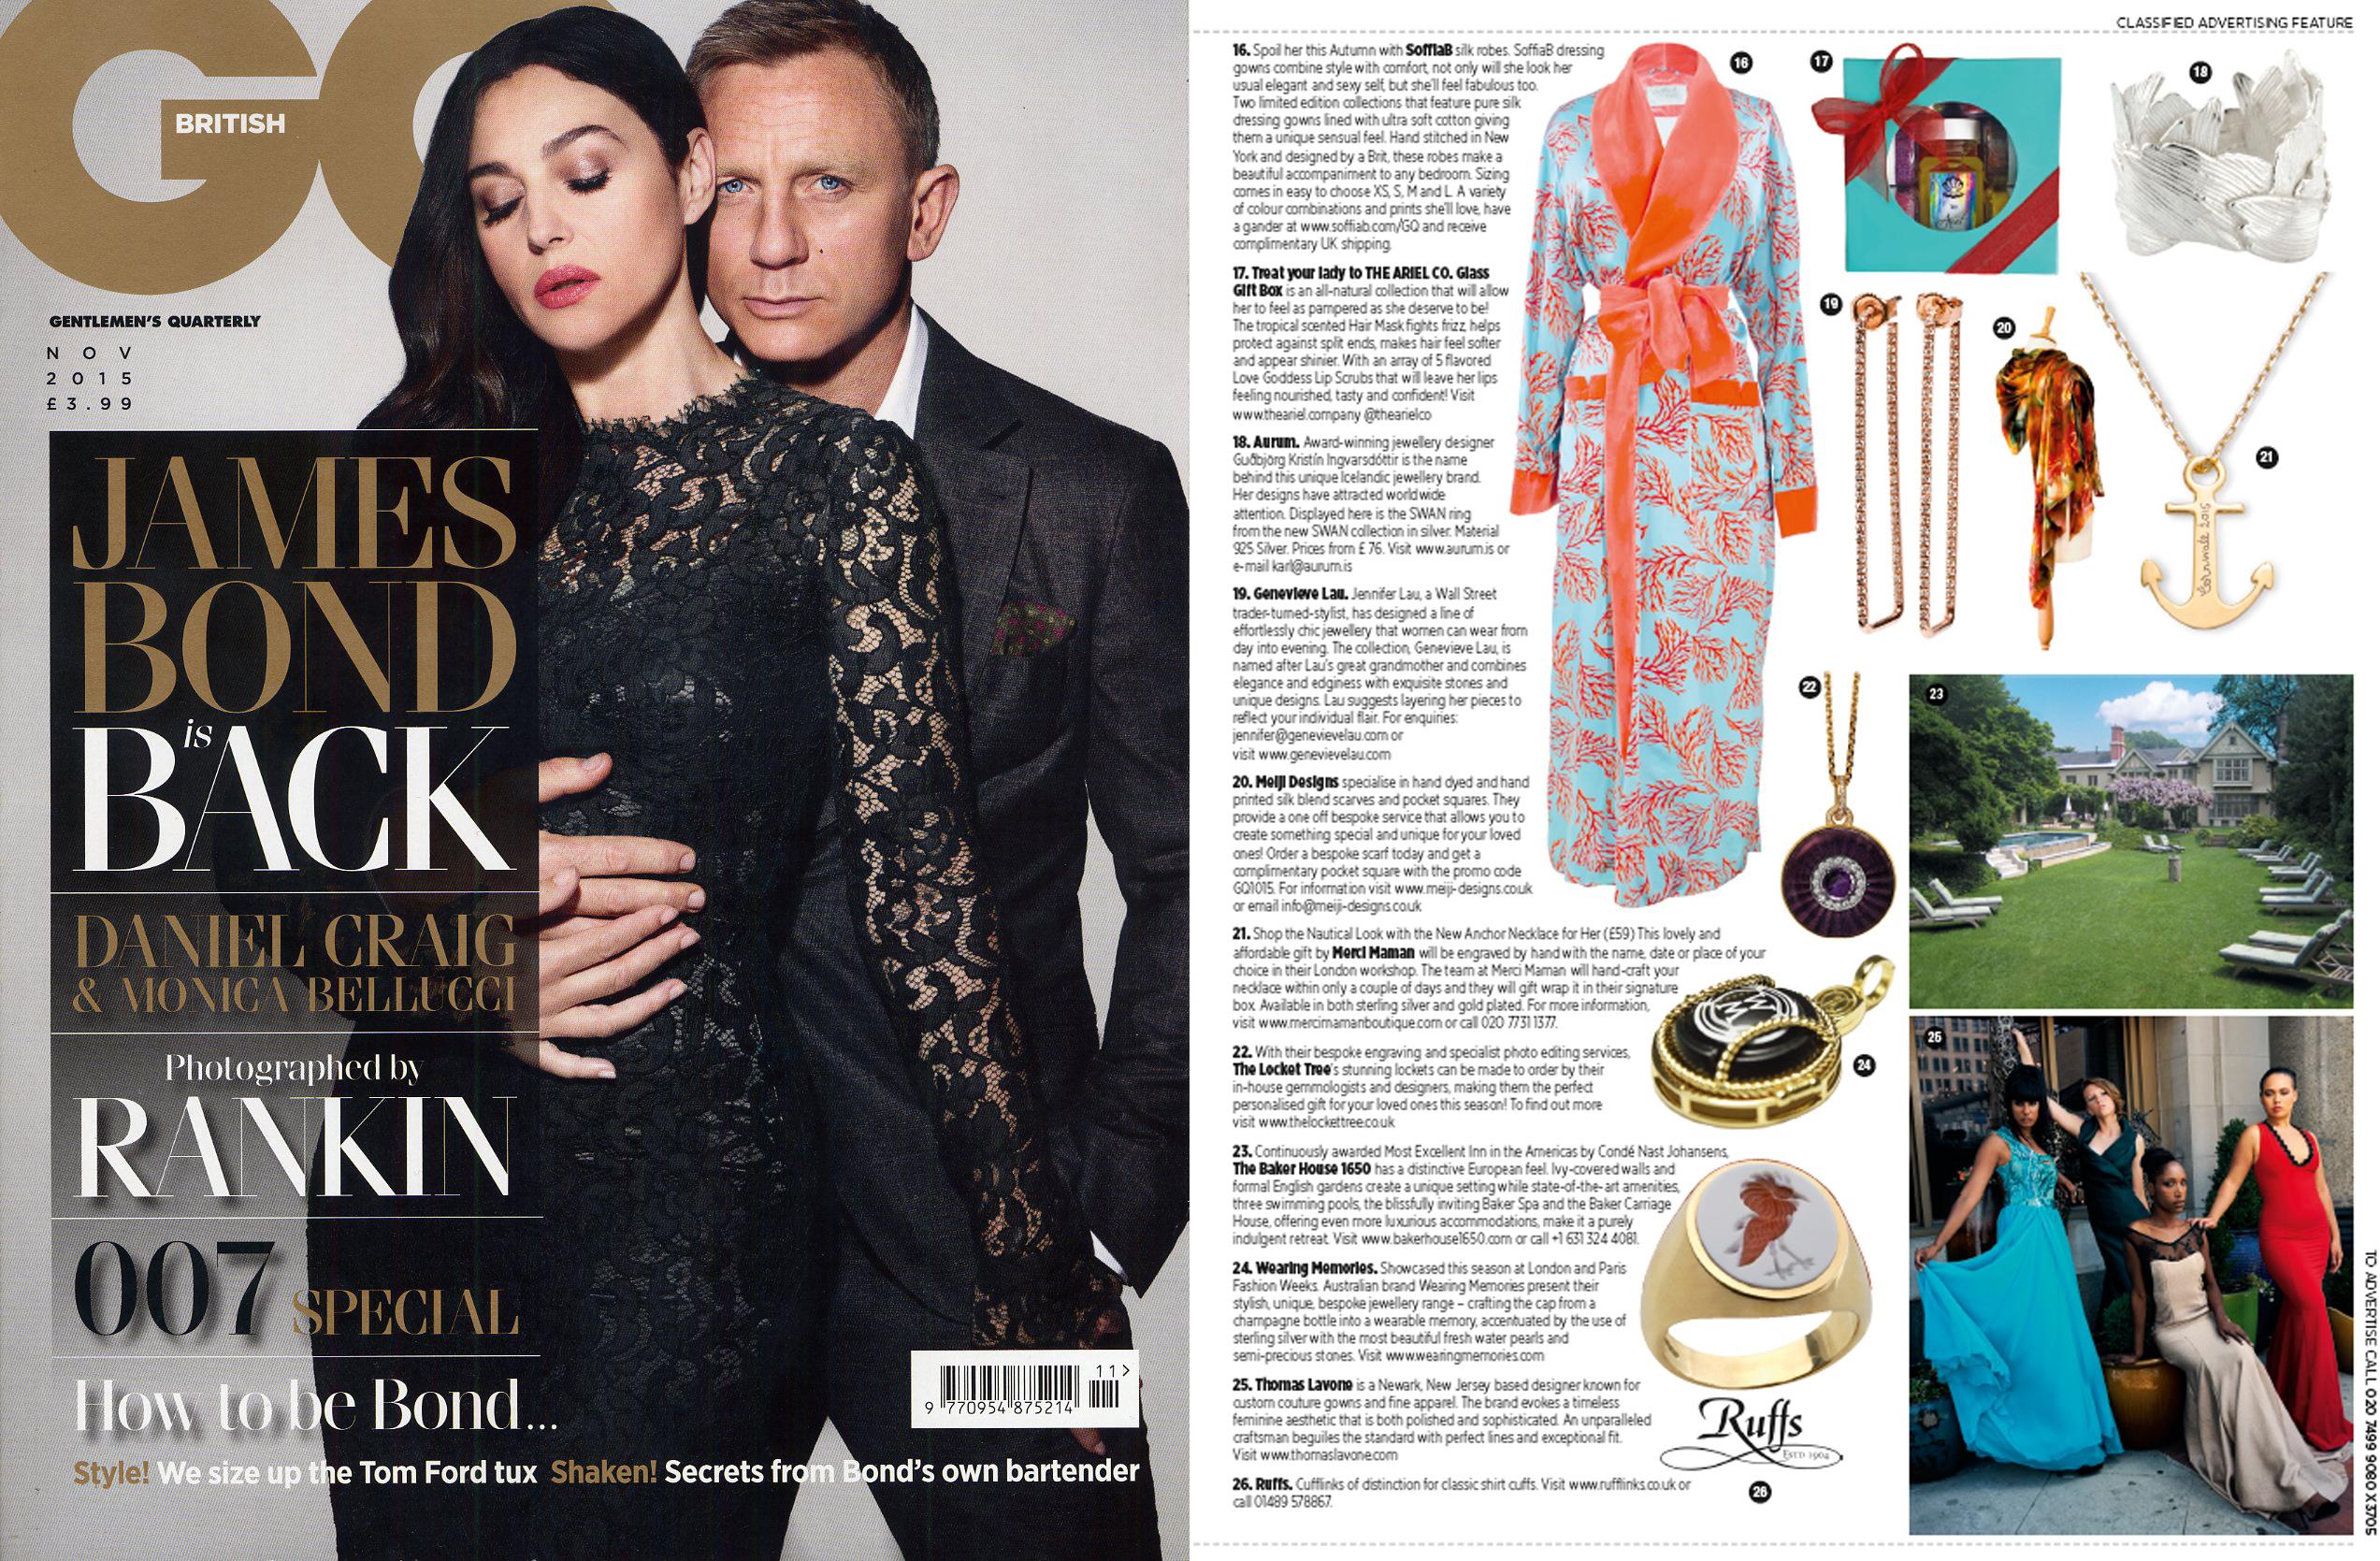 Gentleman's Quarterly November 15